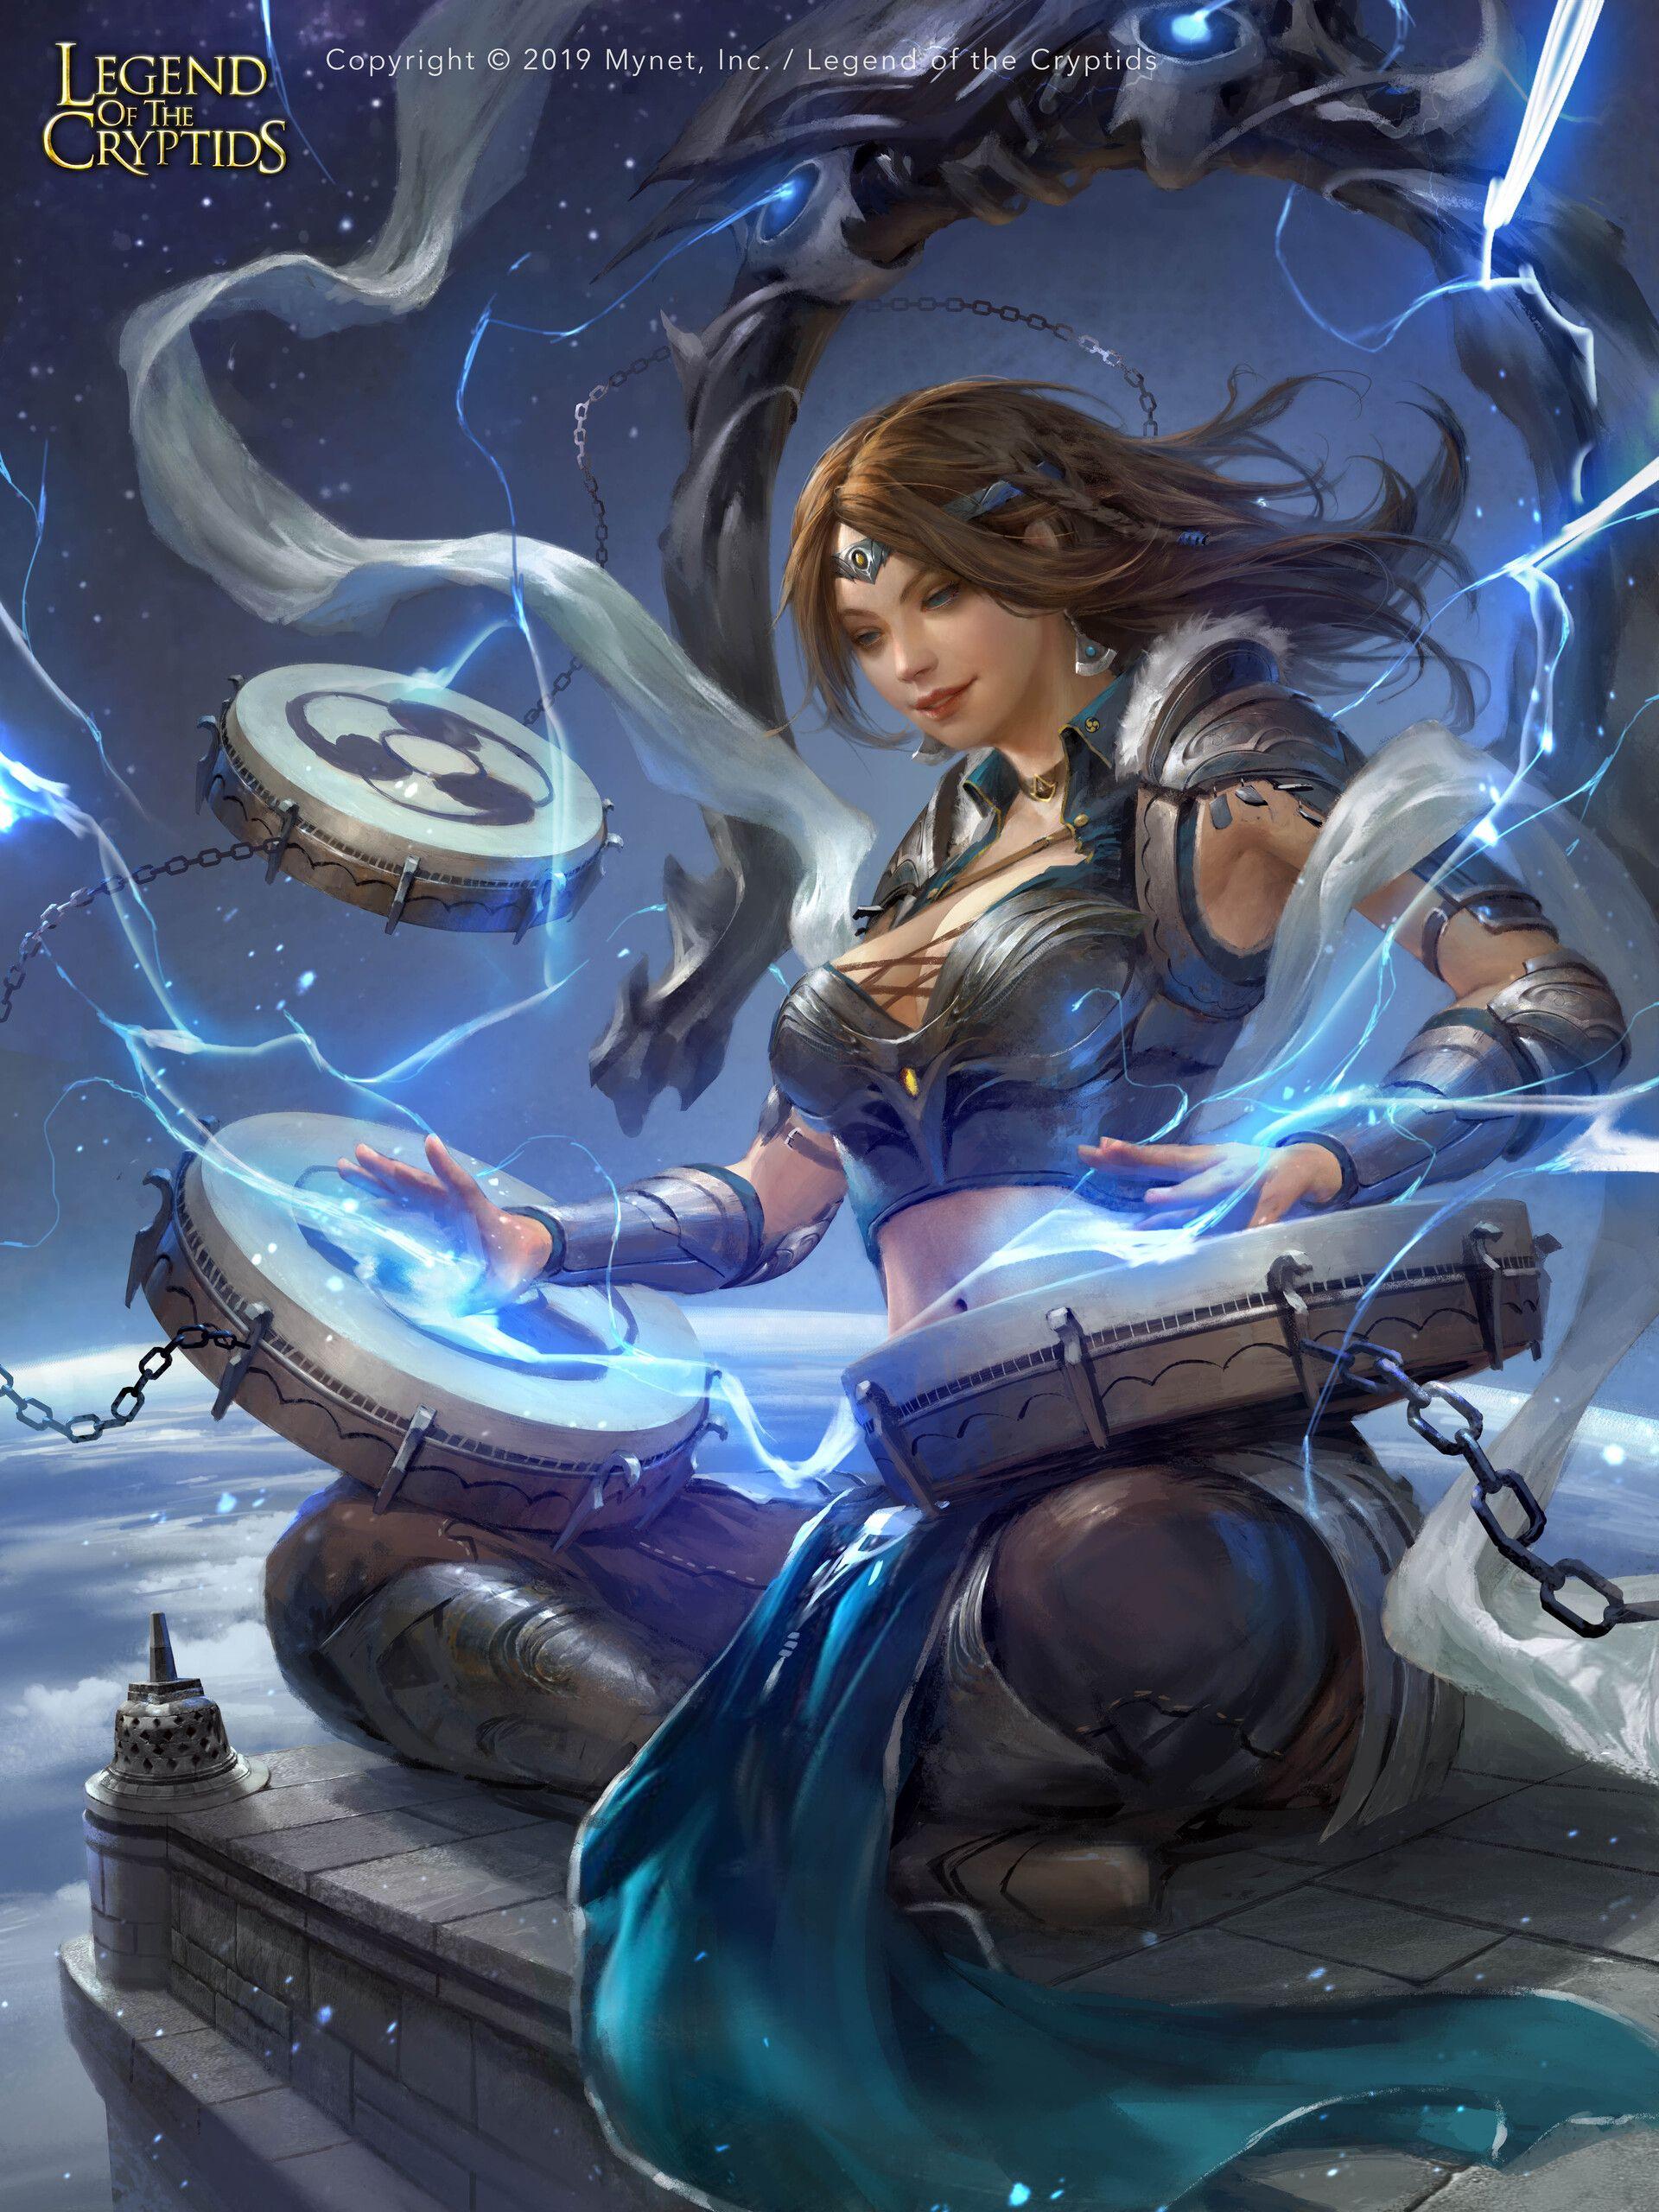 Dark Fantasy Raijin Reg For Legend Of The Cryptids Loc C Mynet Inc Art Of Fajareka Setiawan Pro Fr Dark Fantasy Fantasy Art Women Fantasy Art